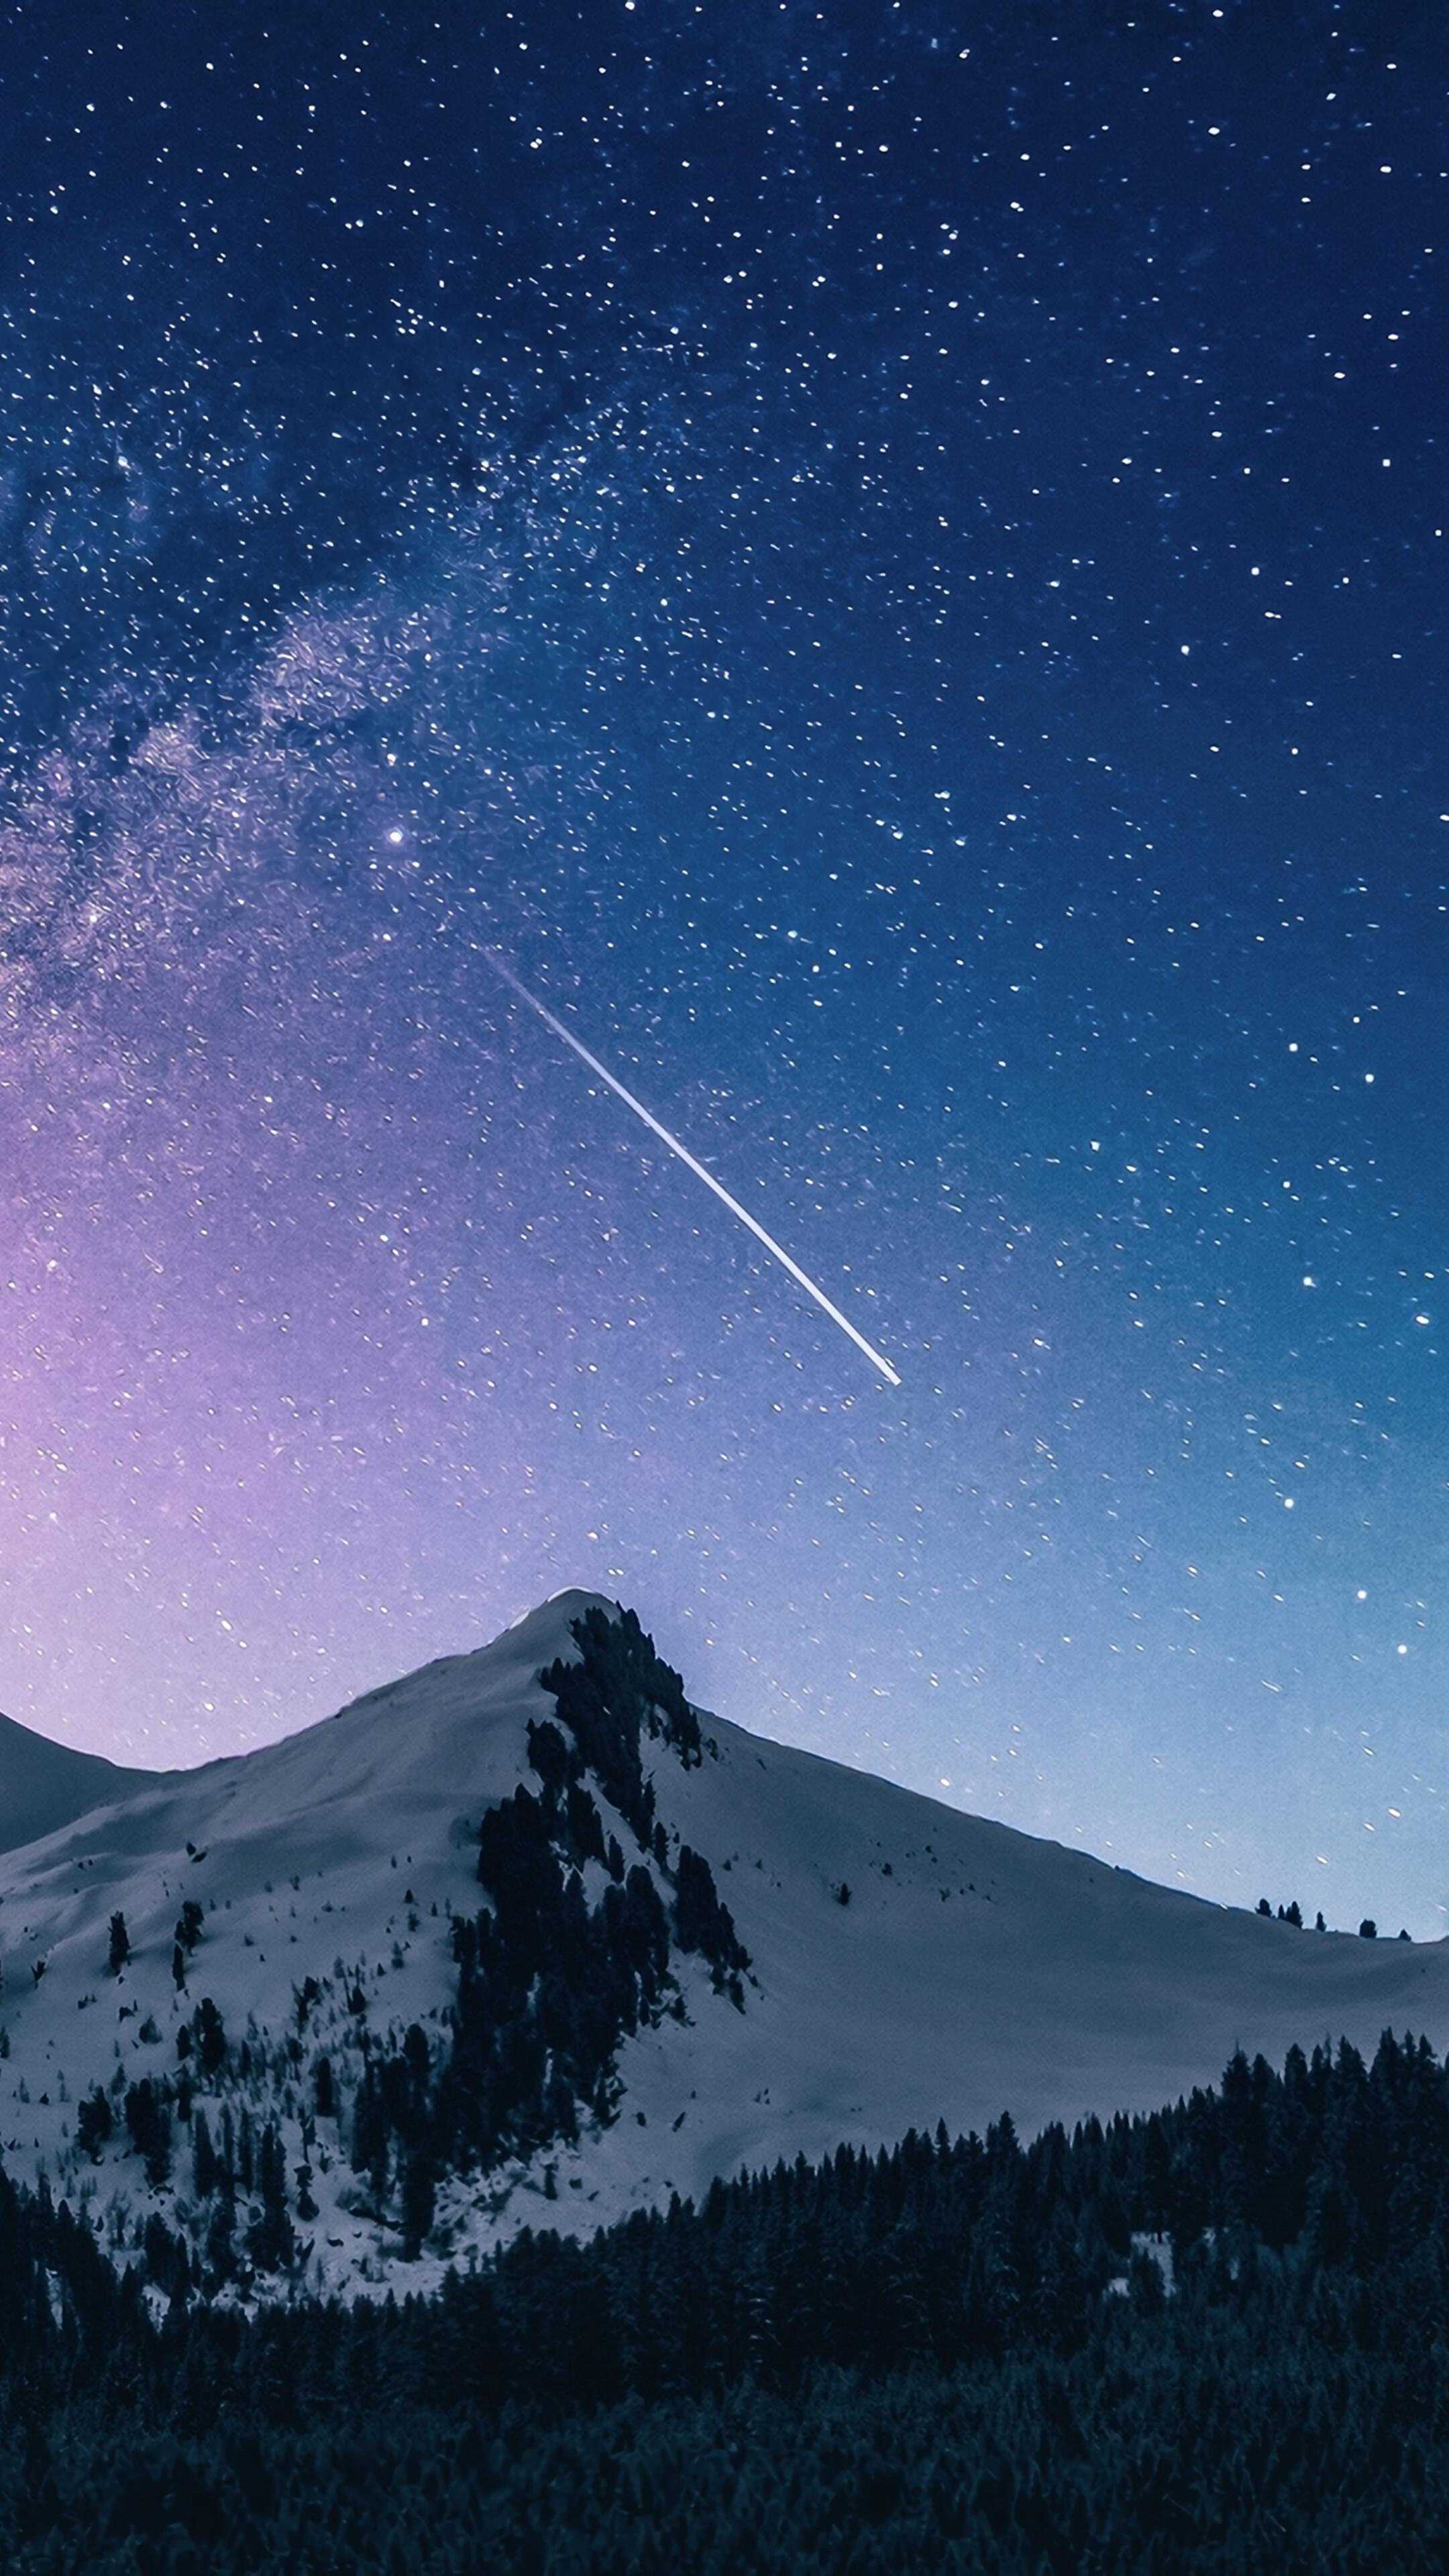 wallpaper iphone night sky